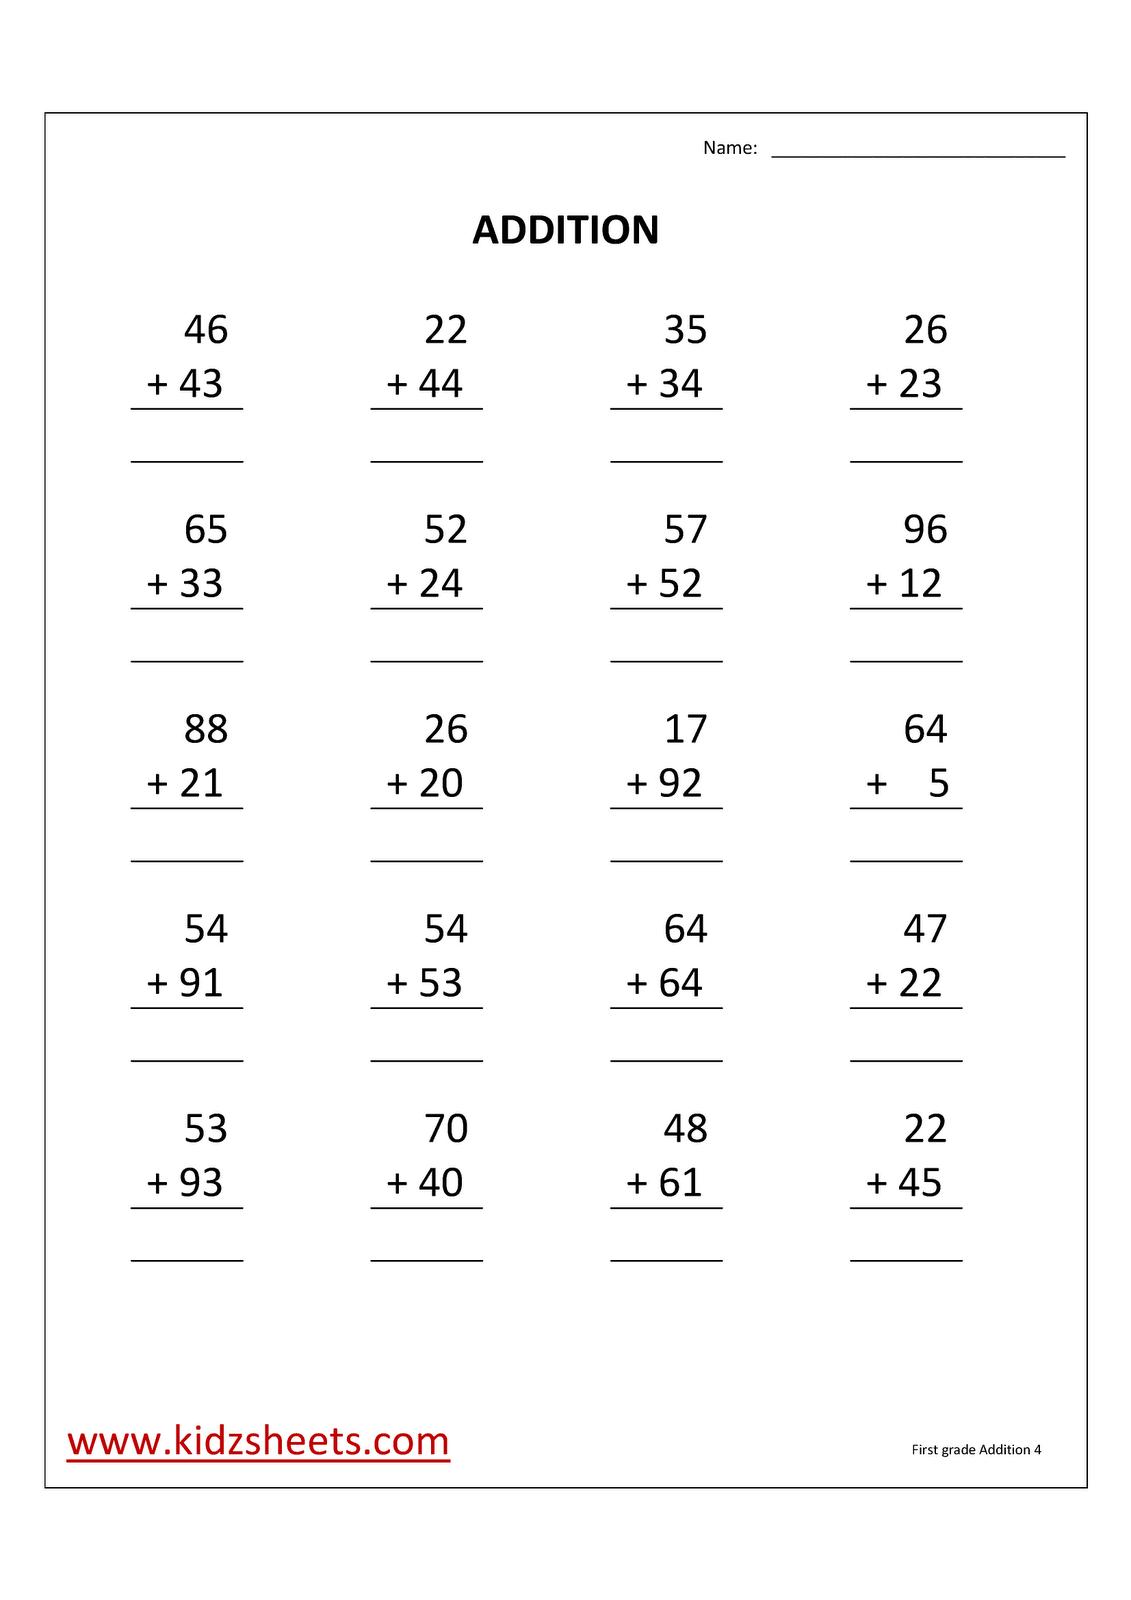 Kidz Worksheets First Grade Addition Worksheet4